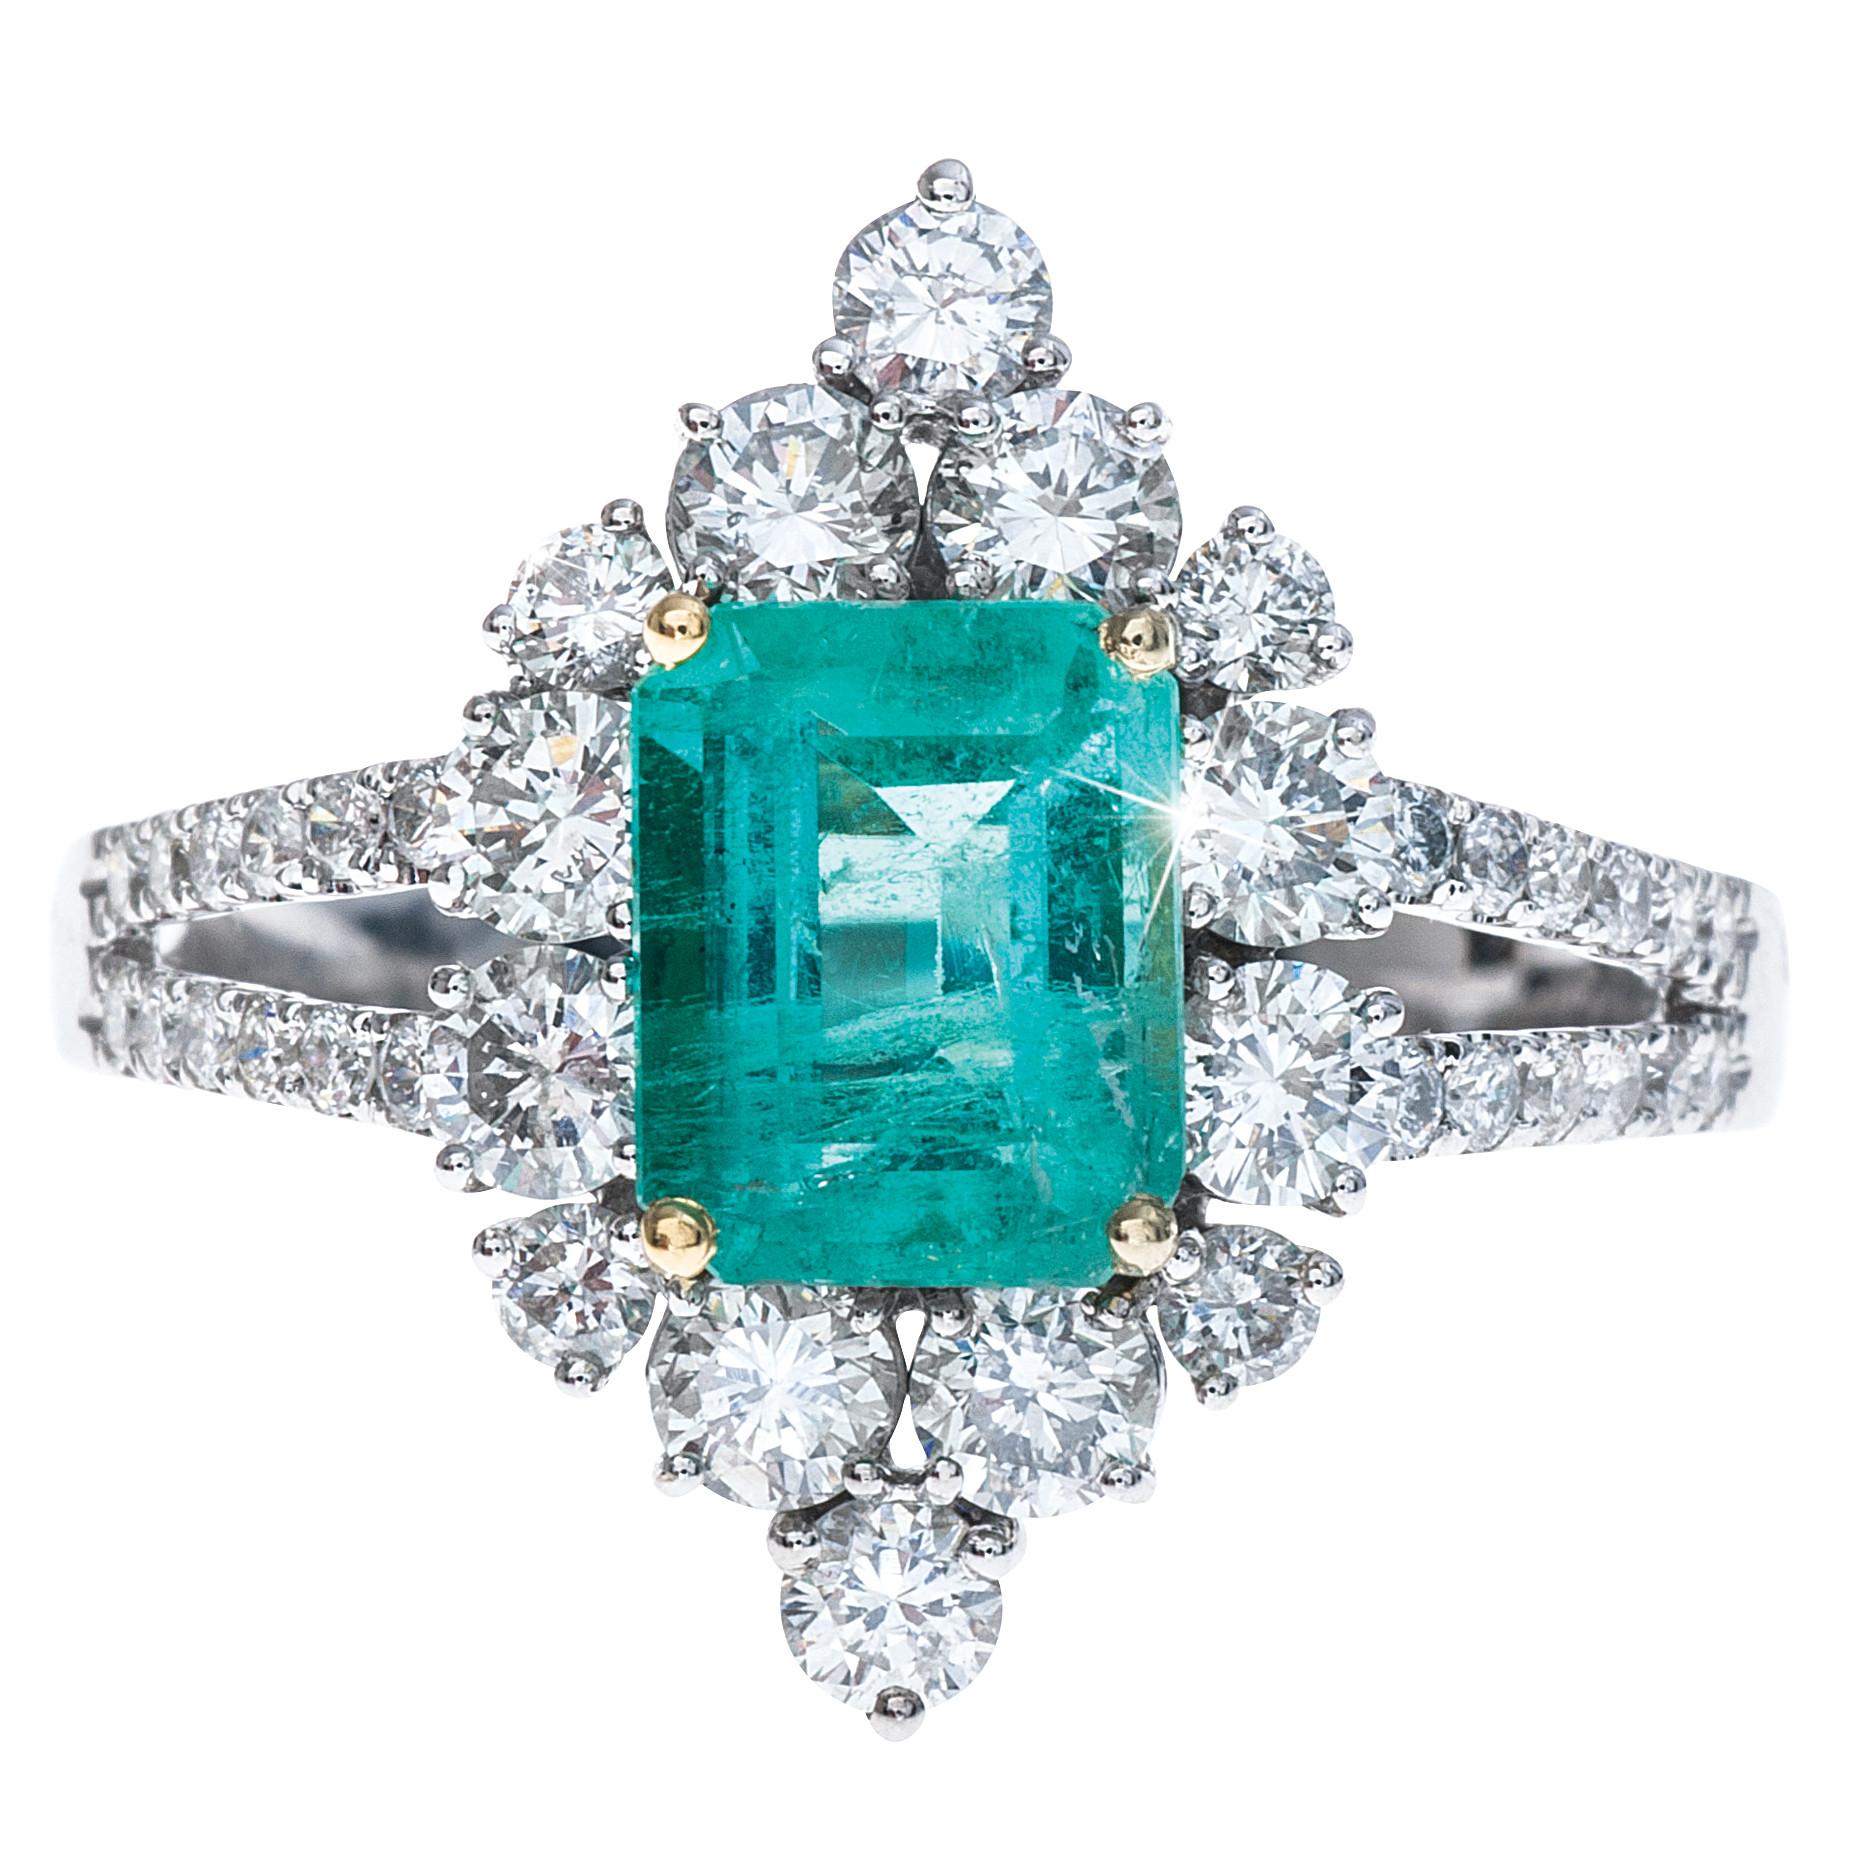 New 2.51 CTW Emerald & Diamond Halo Ring